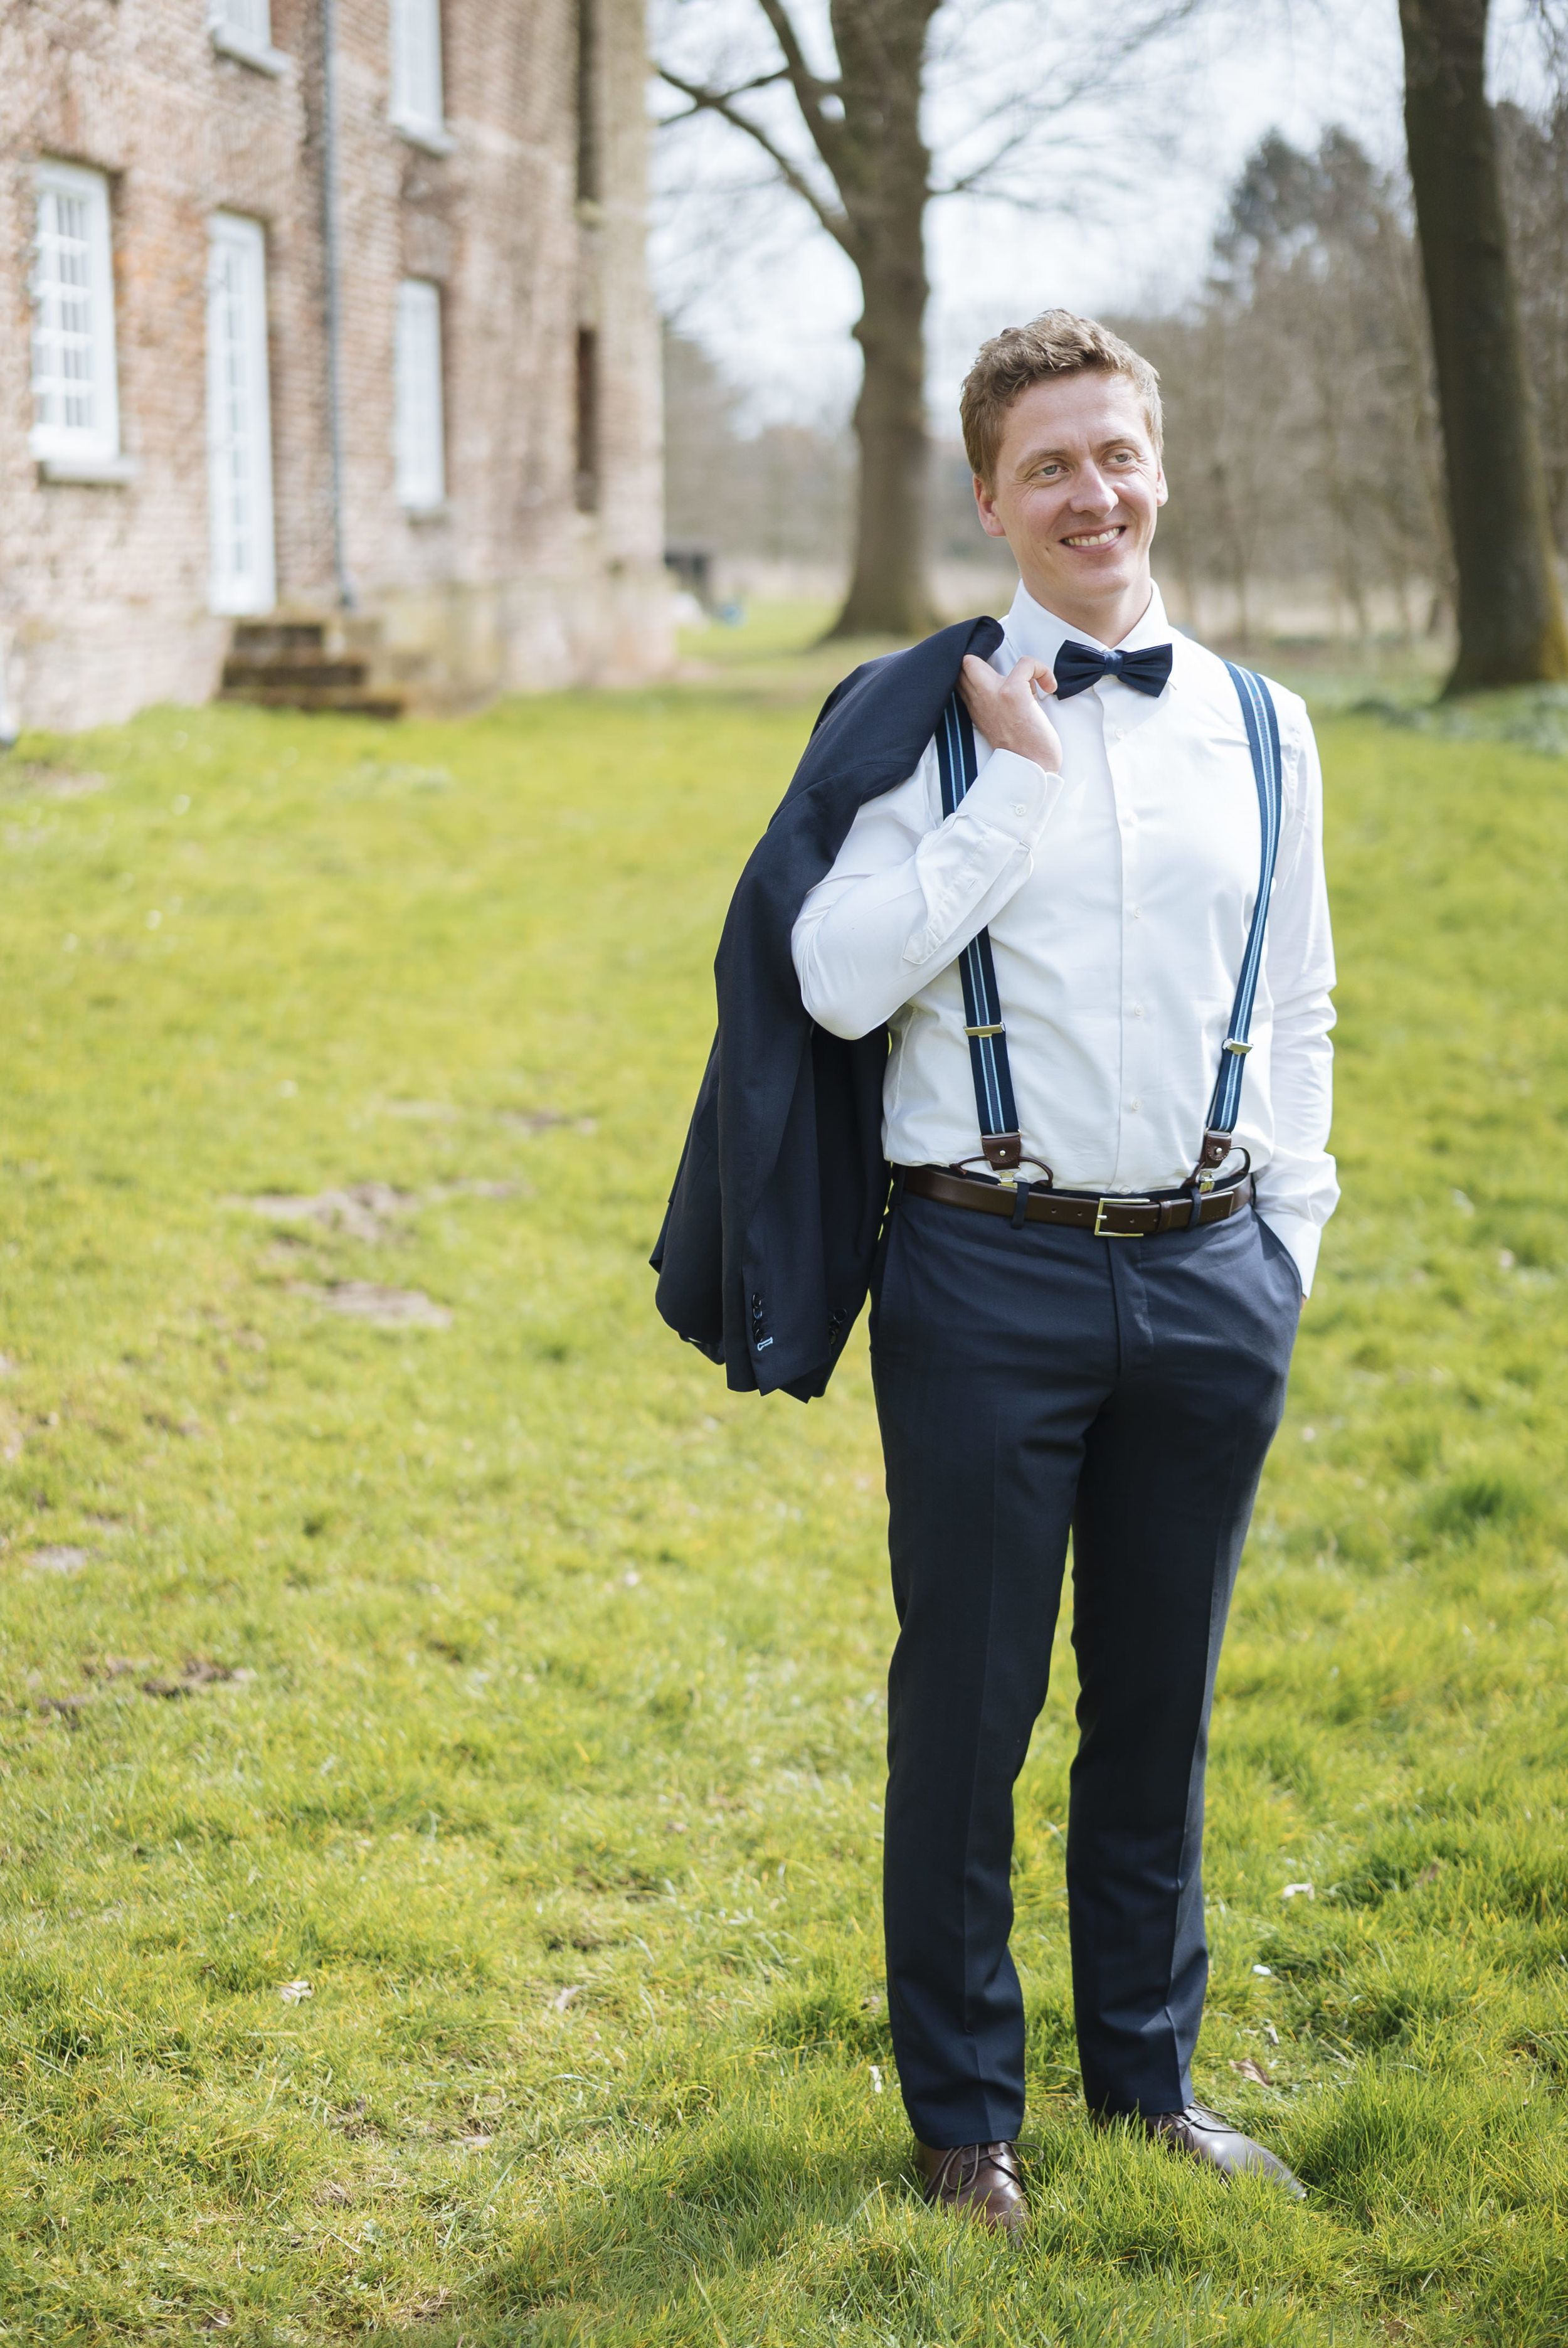 Hochzeitsfotograf-Schlossruine-Hertefeld-Weeze-031.jpg